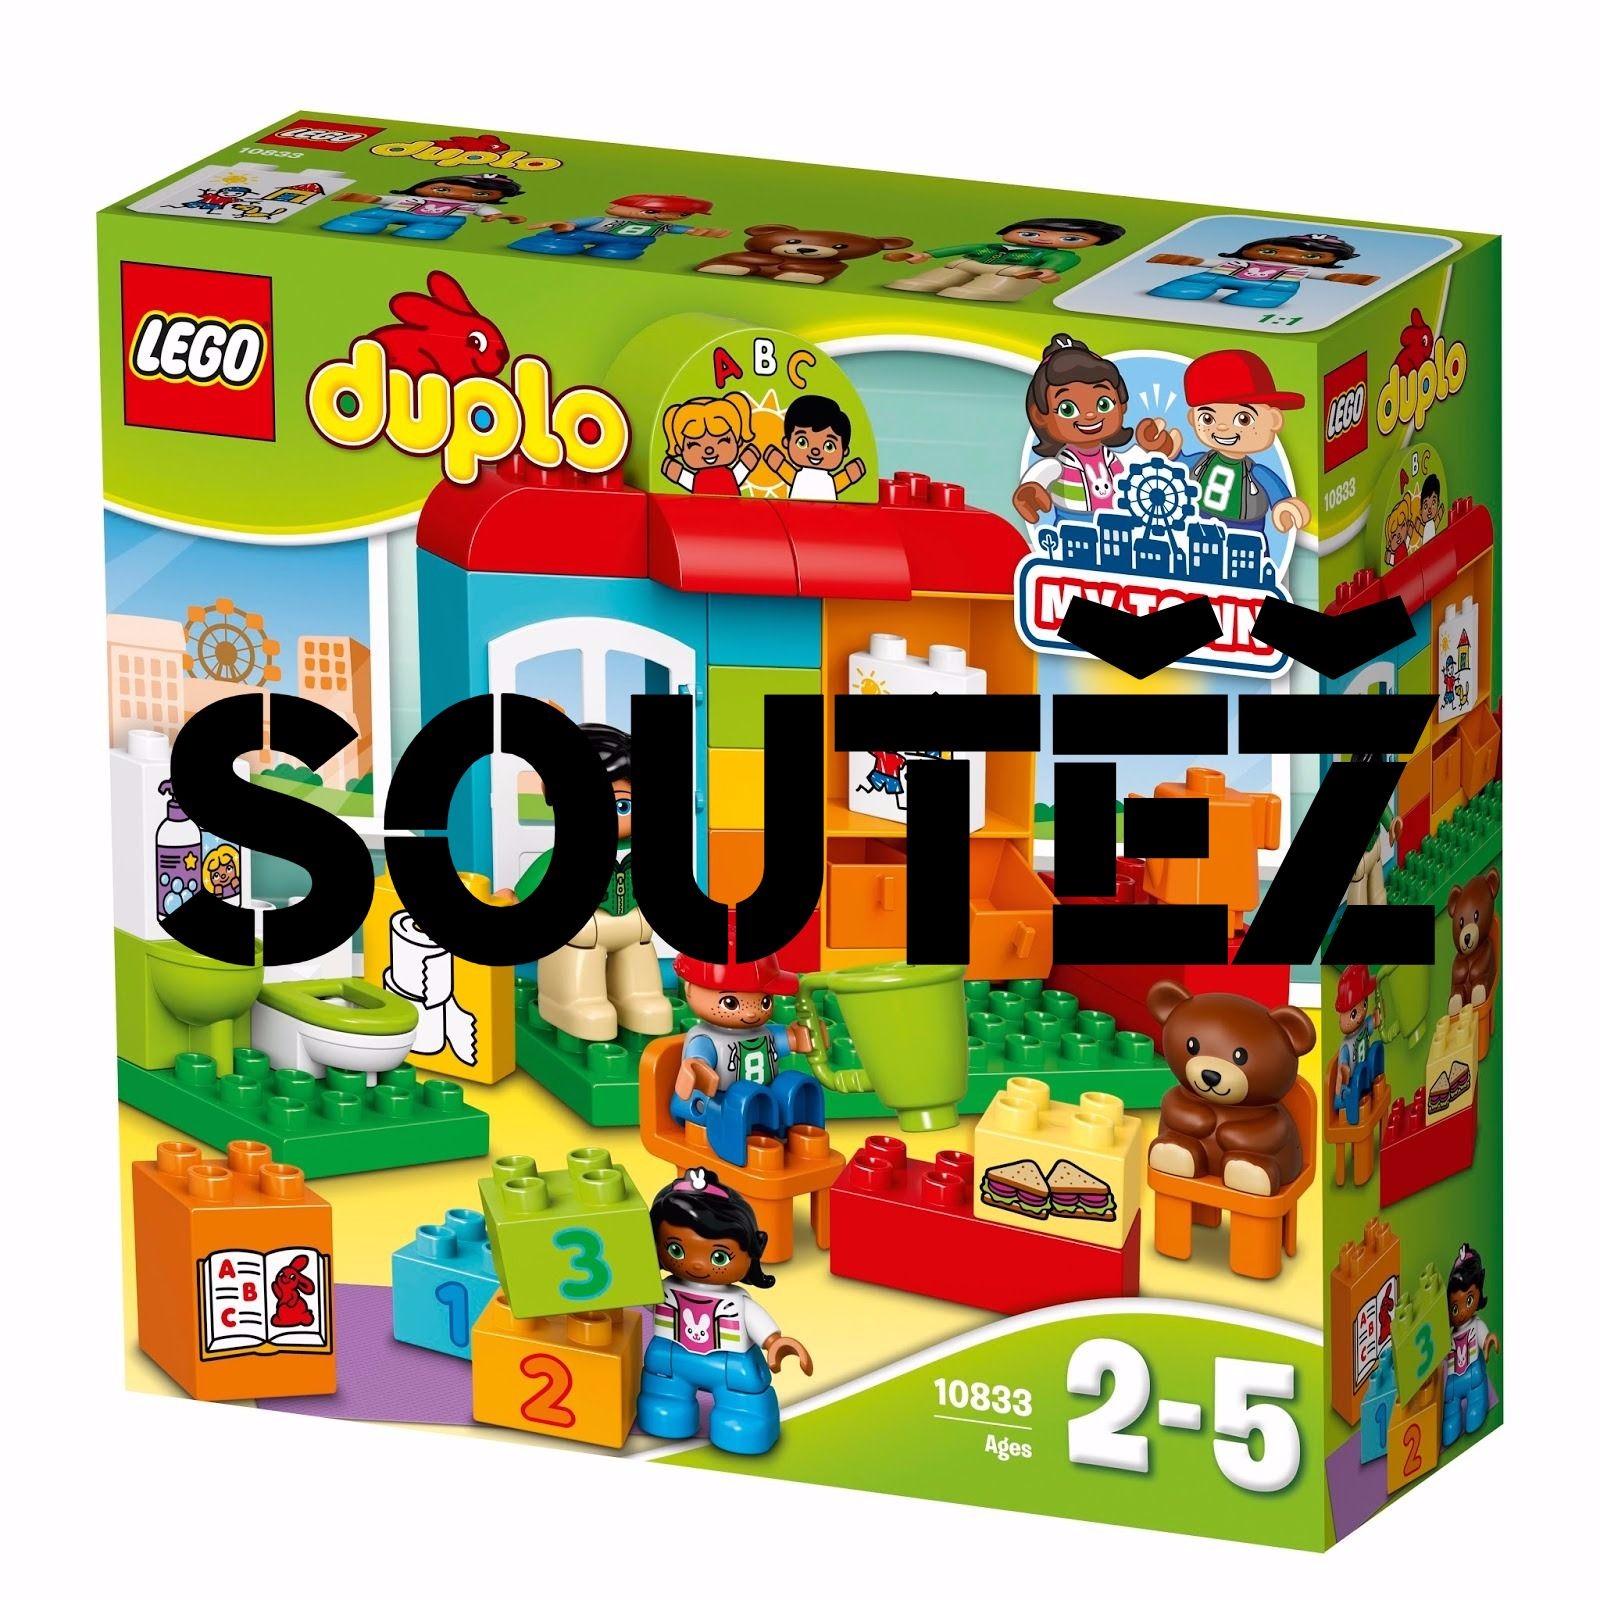 Vyhraj jednu ze dvou stavebnic LEGO DUPLO Školka